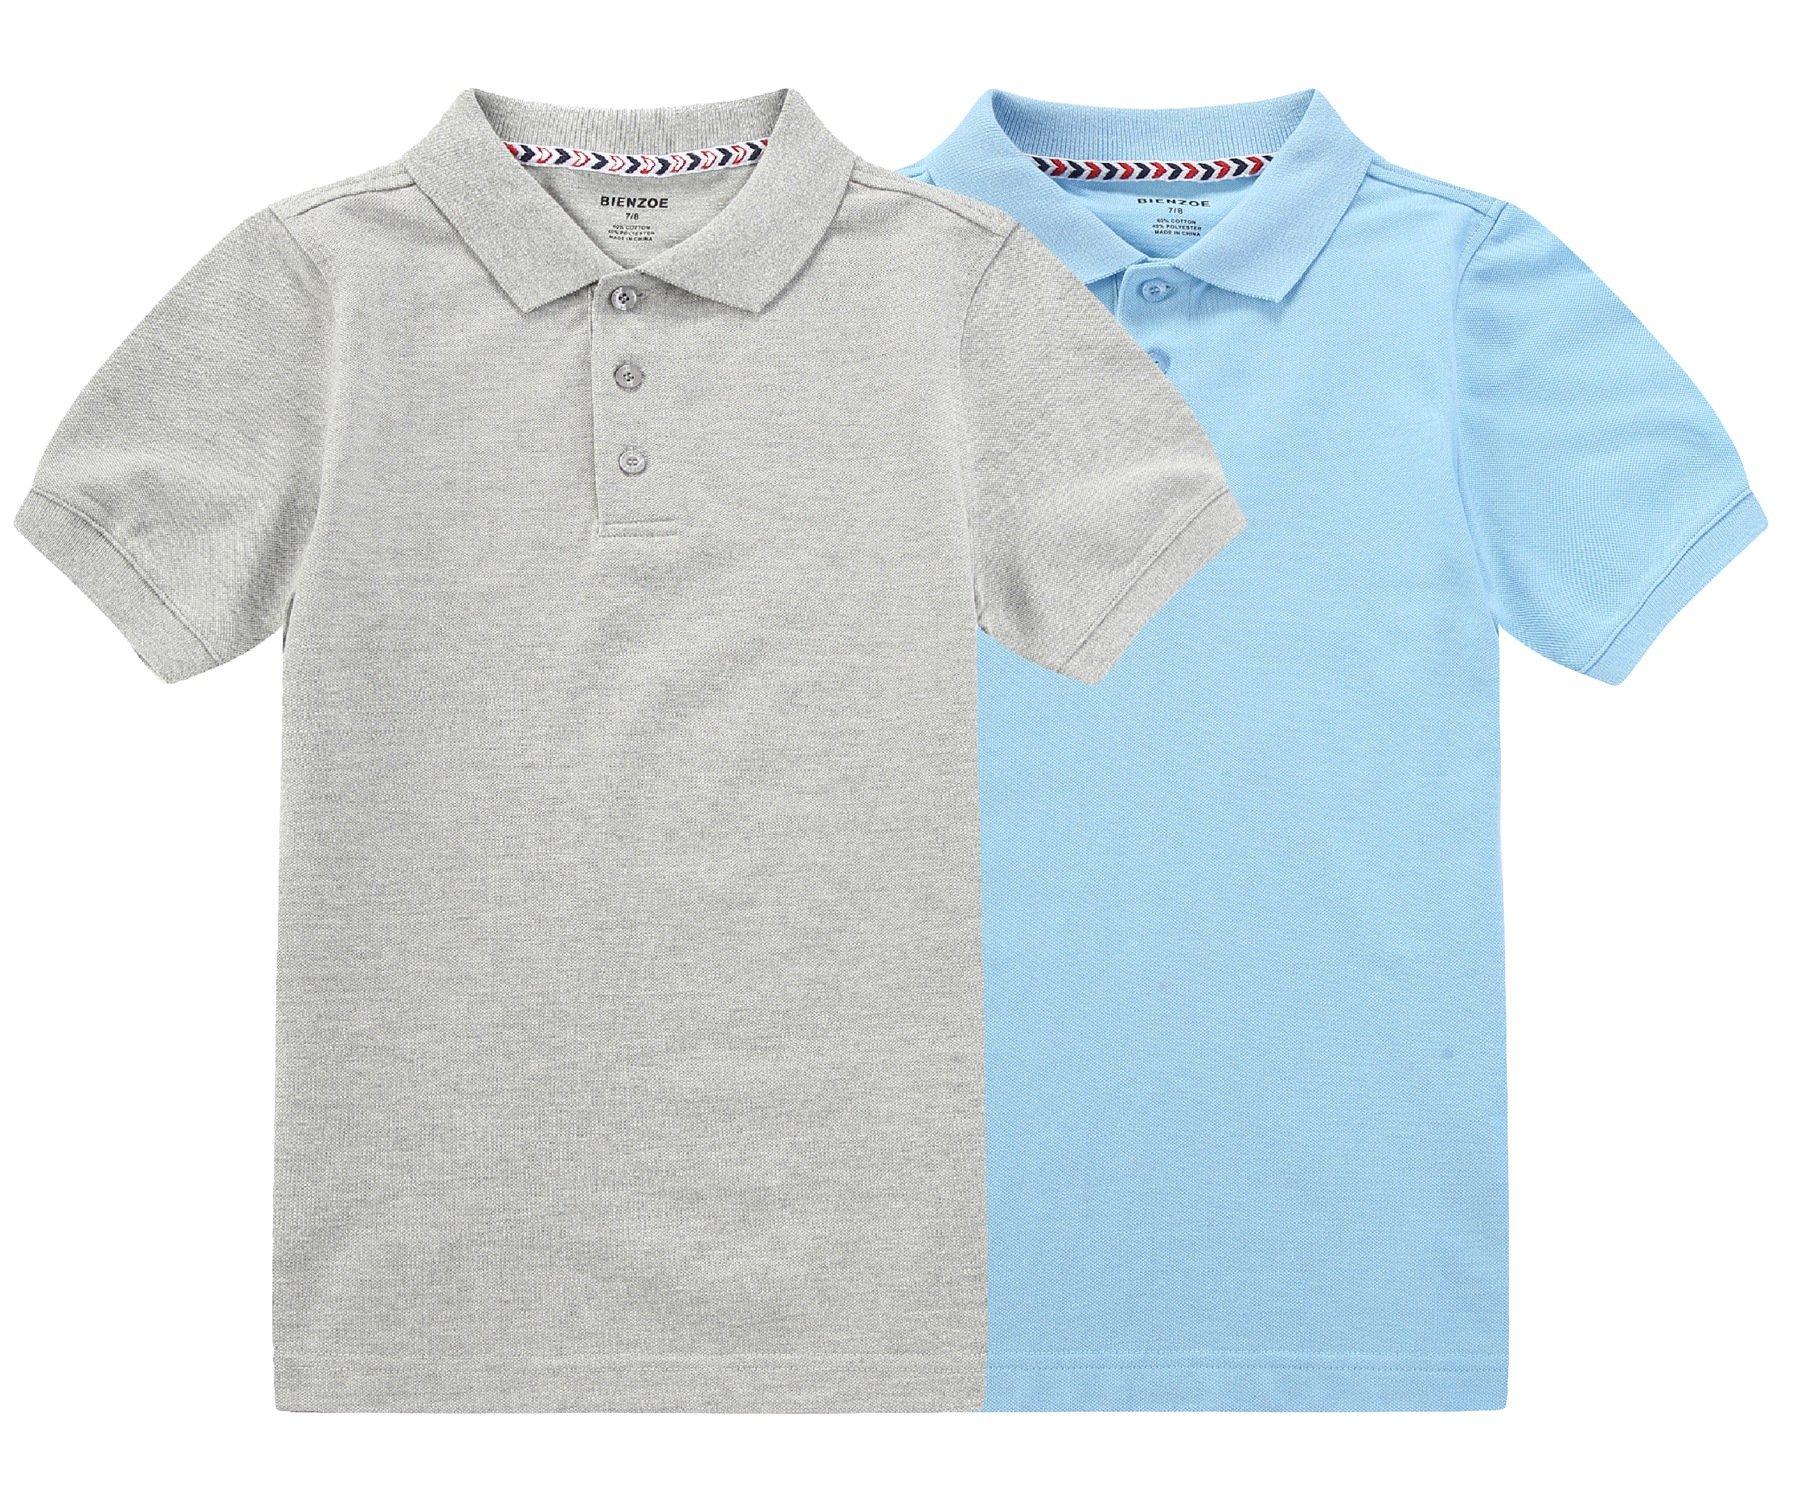 Bienzoe Boy's Antimicrobial Breathable Short Sleeve Polo 2pcs PackB 7/8